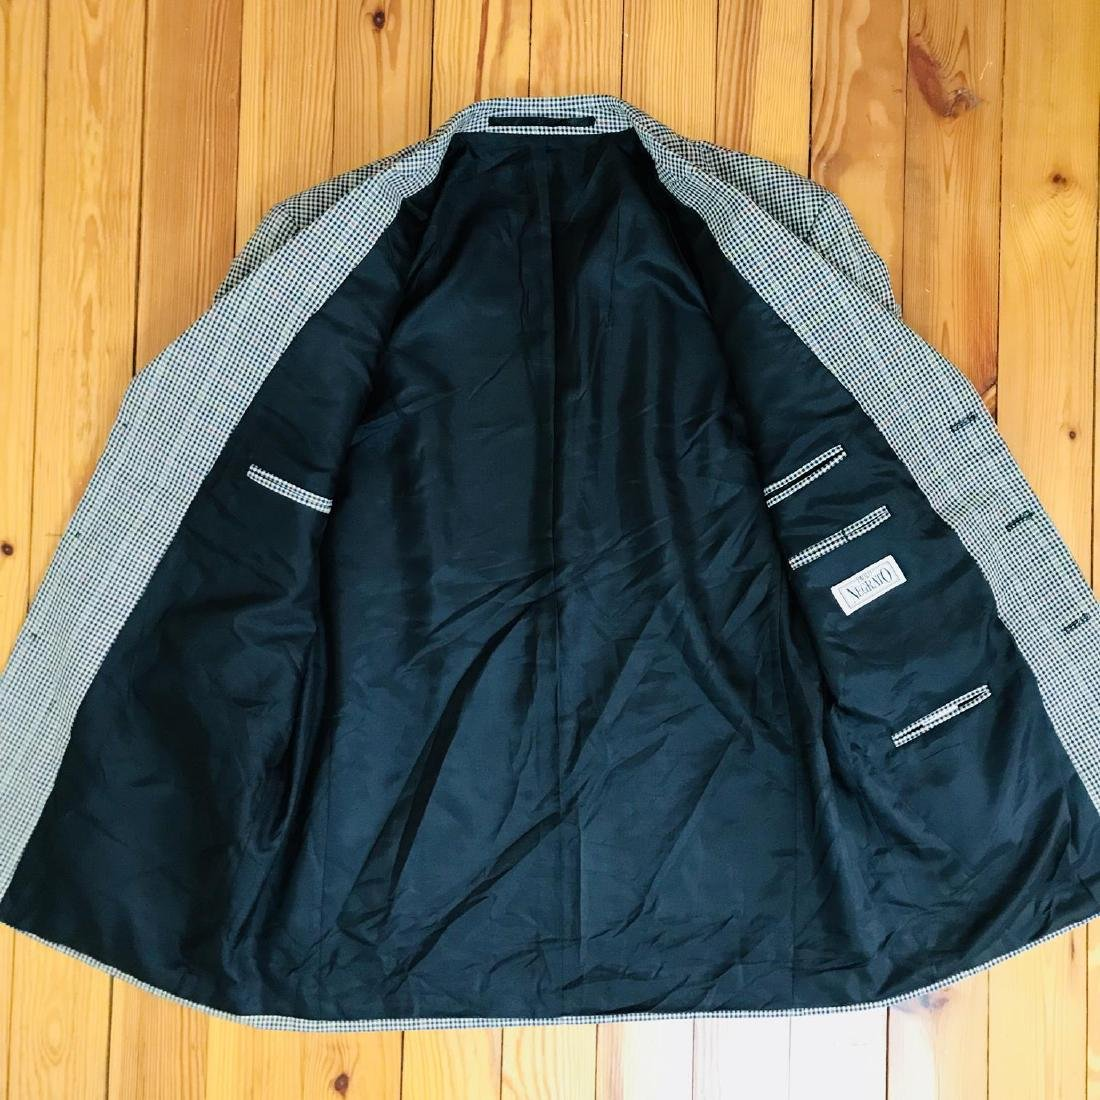 Vintage Men's Paolo Negrato Jacket Blazer Size US 40 - 6